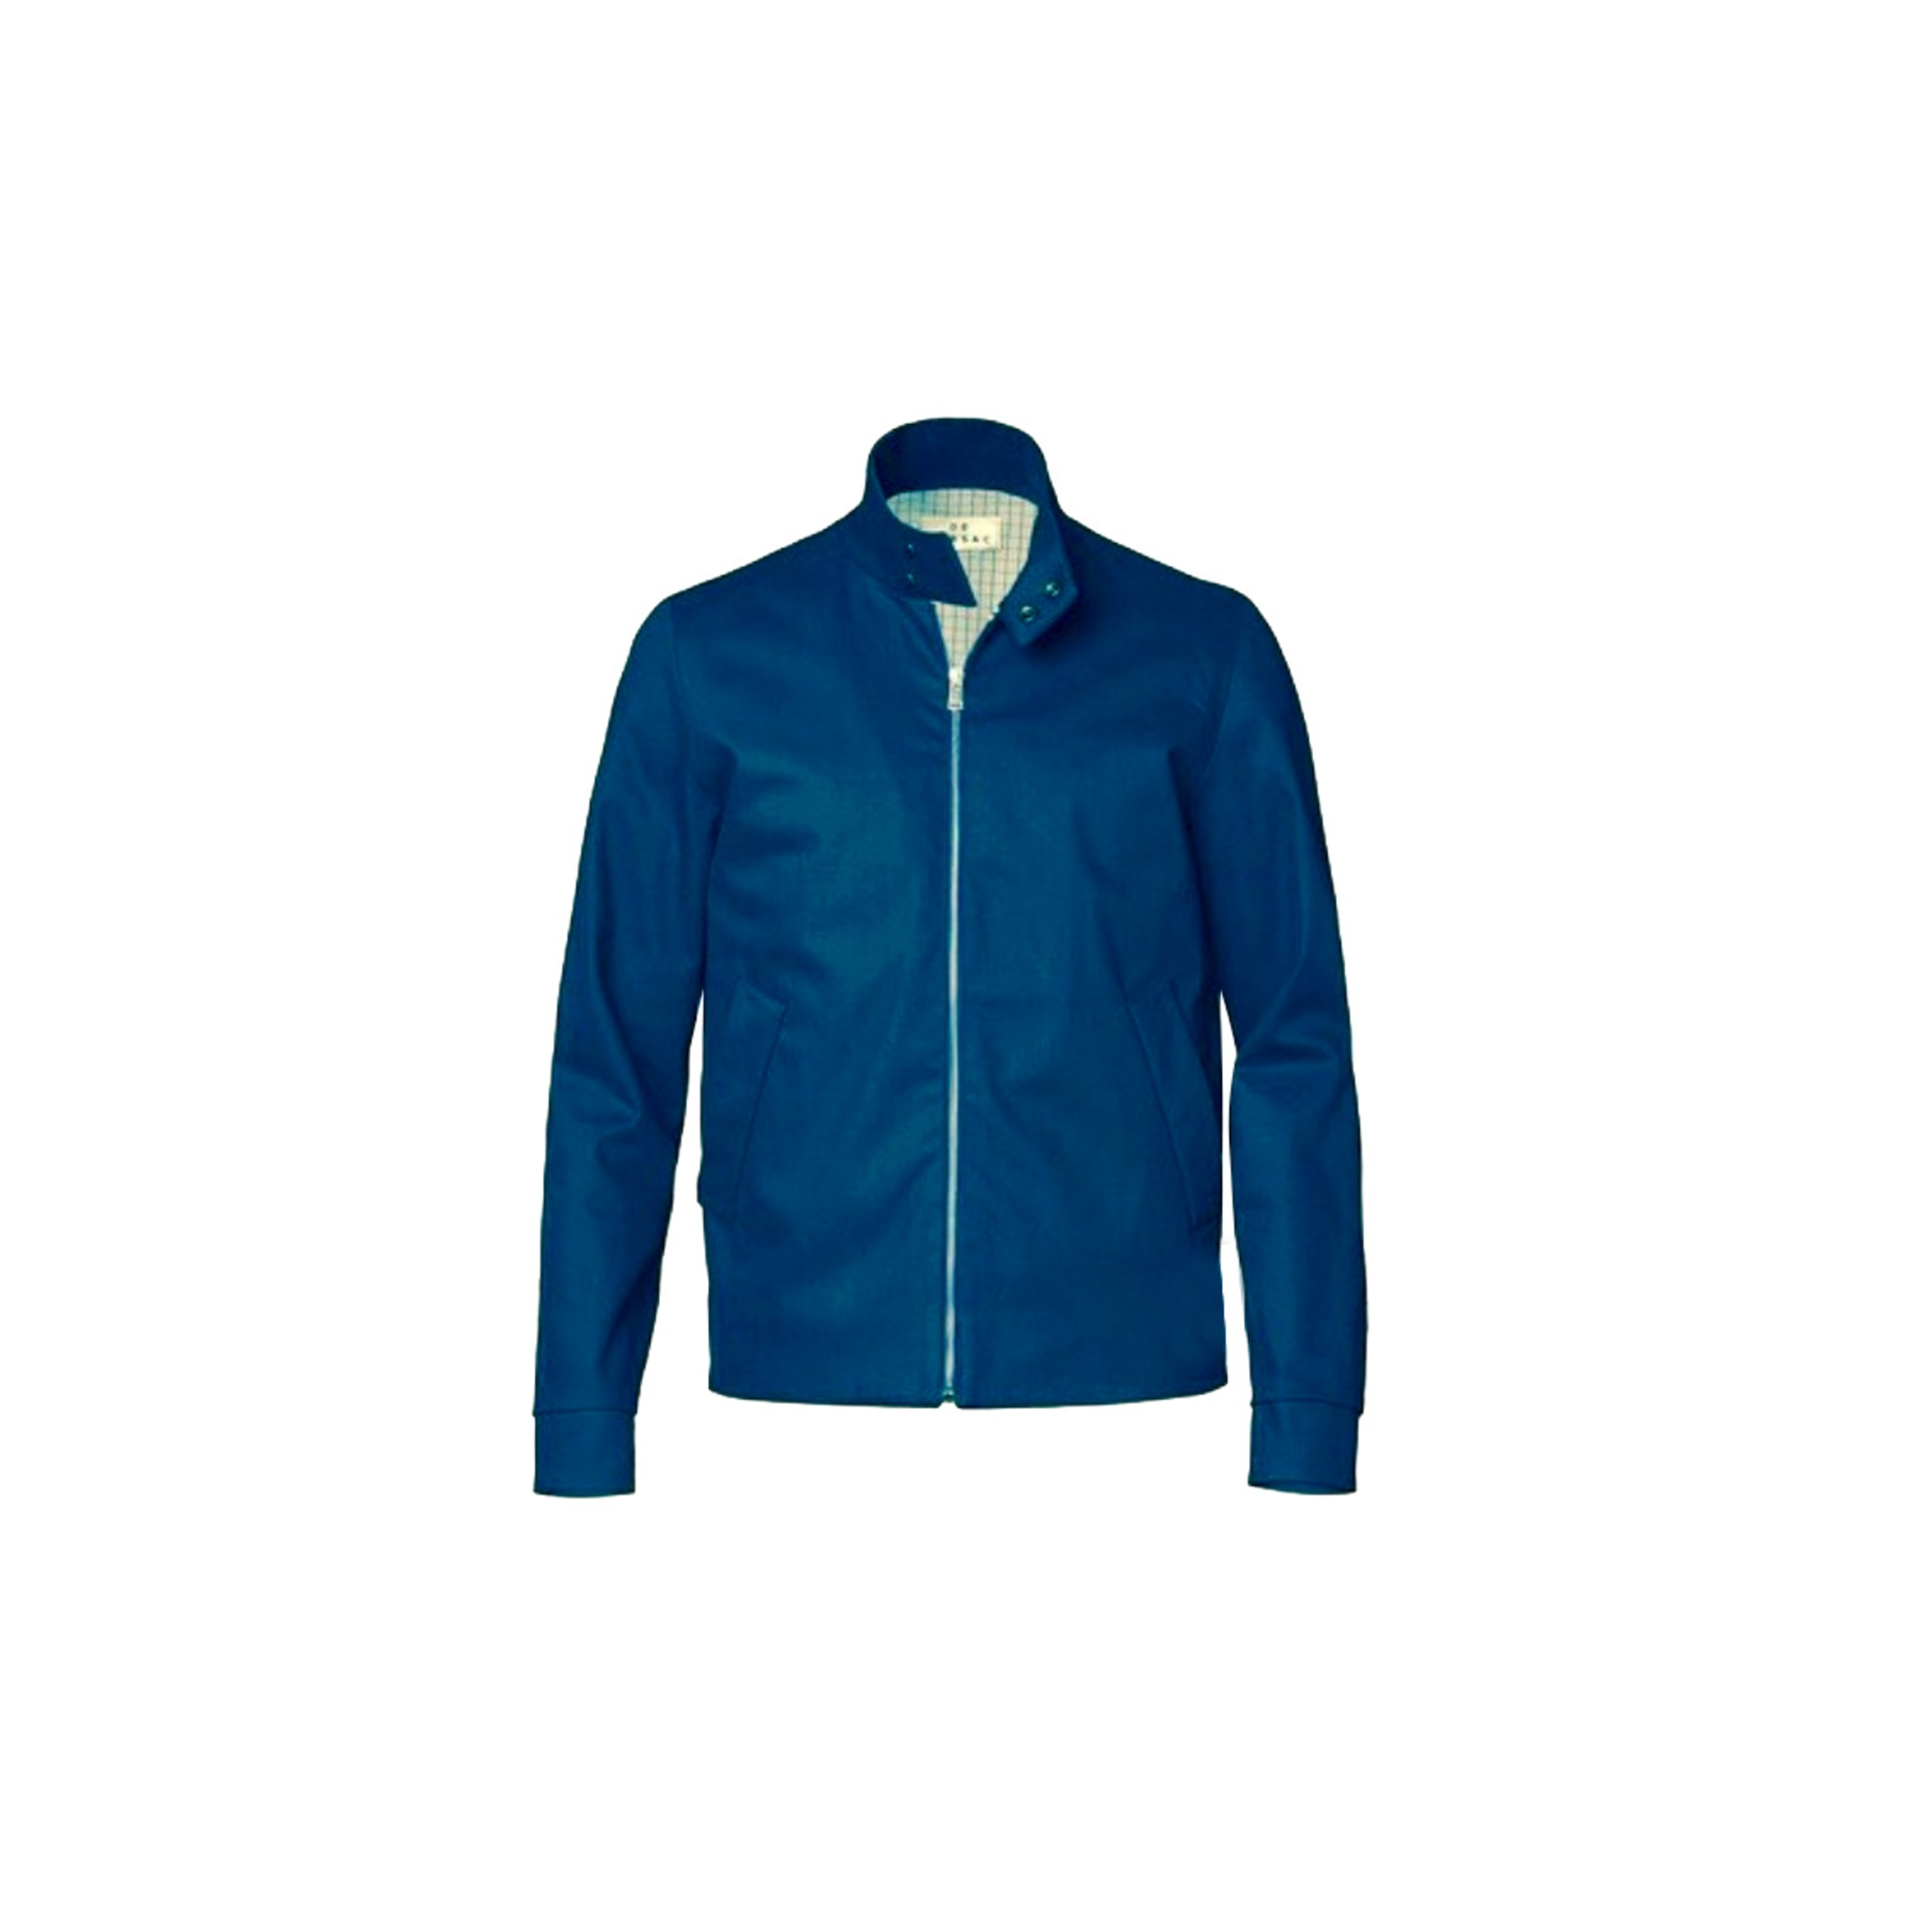 Blouson DE FURSAC Bleu, bleu marine, bleu turquoise